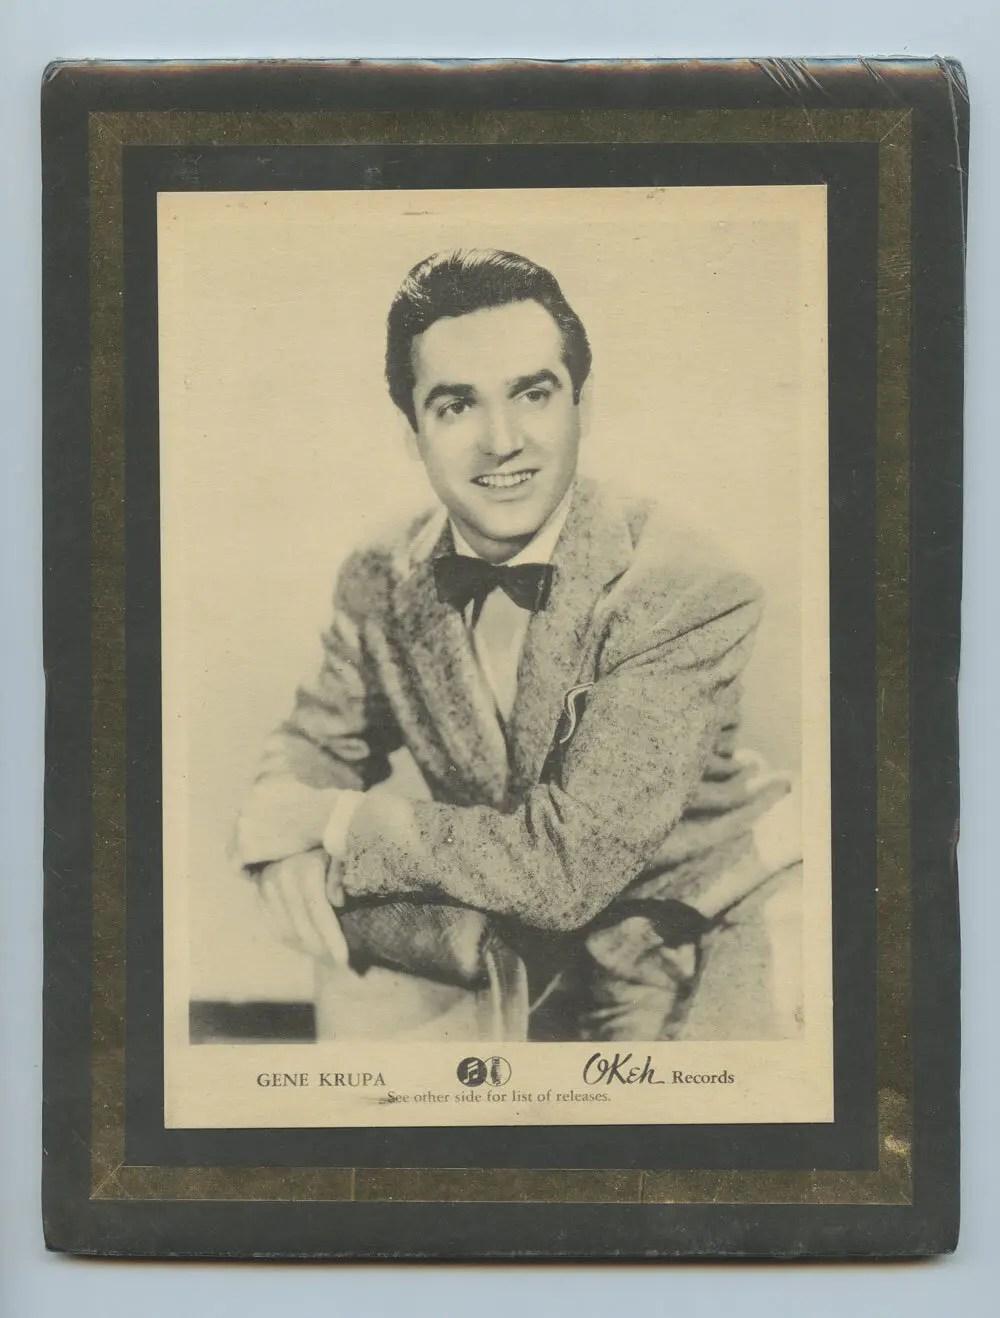 Gene Krupa Photo 1940 New Single Promo OKEH Records